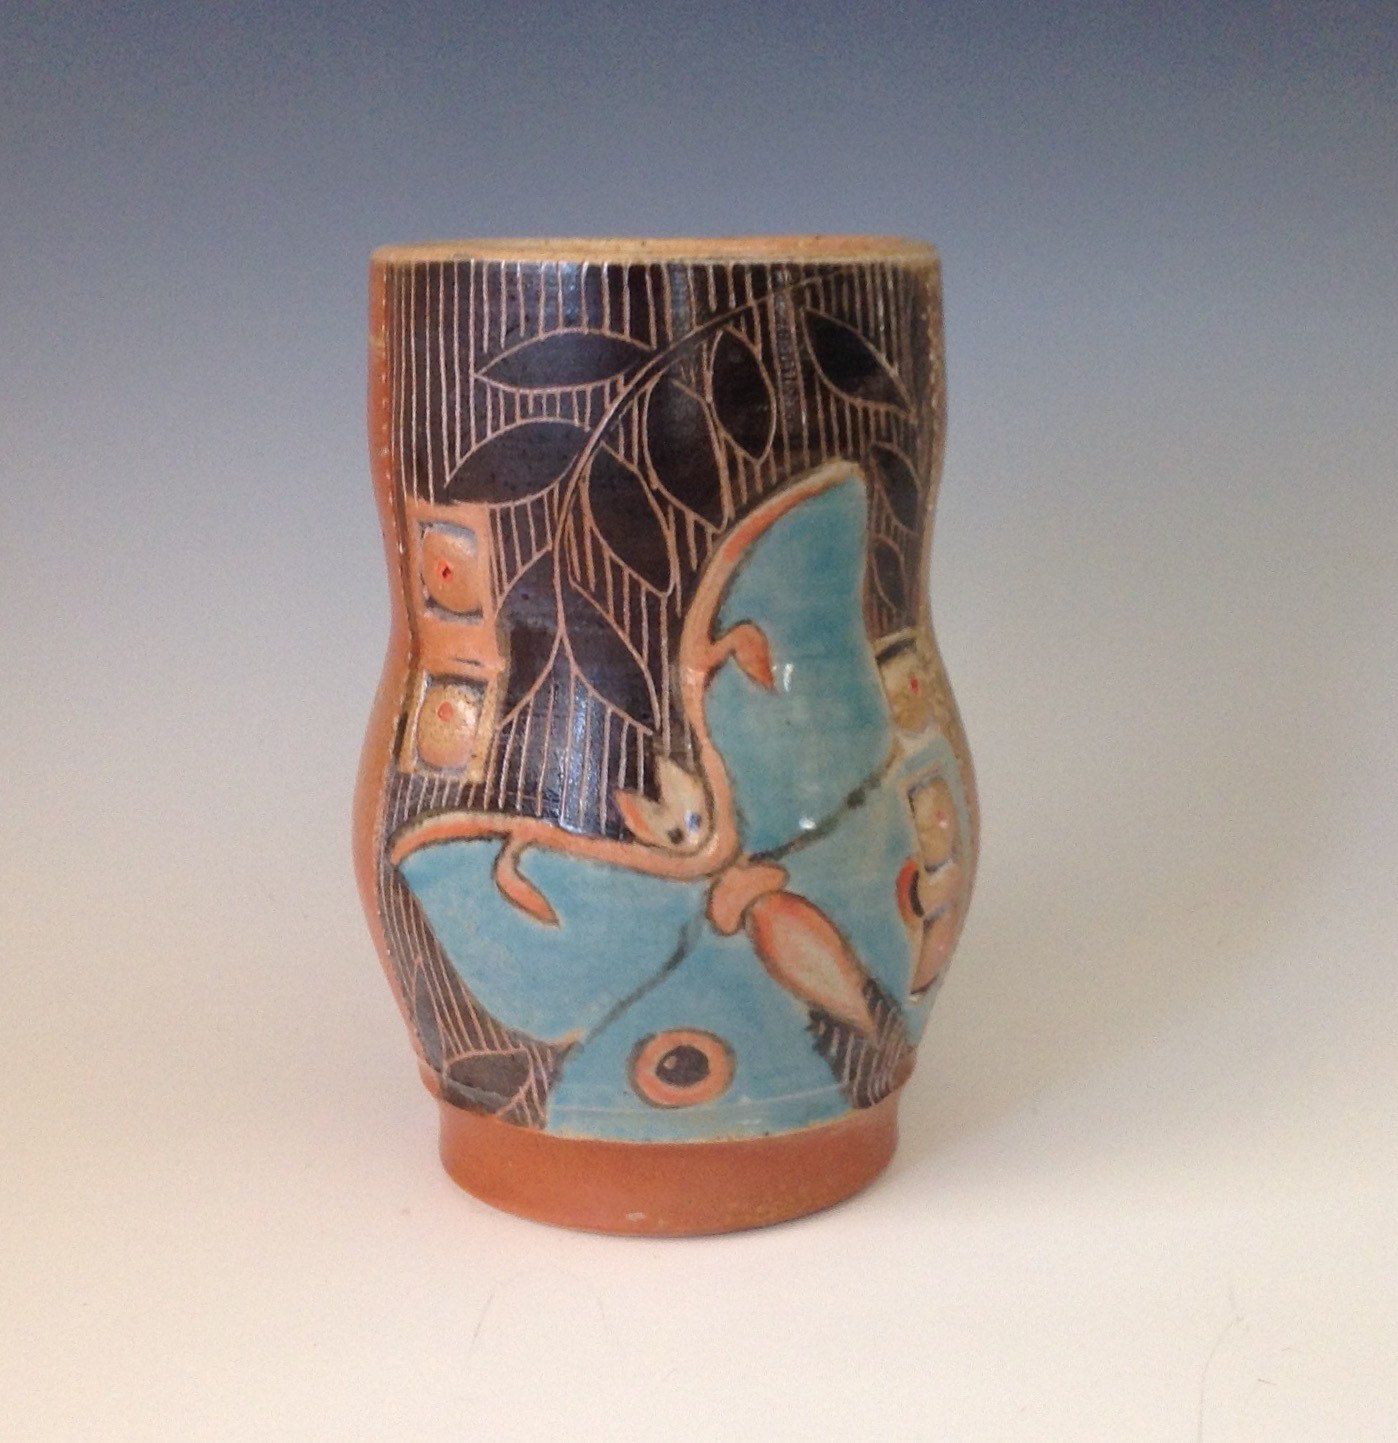 Pottery luna moth vase handmade ceramic vase pottery vase hand pottery luna moth vase handmade ceramic vase pottery vase hand painted vase reviewsmspy